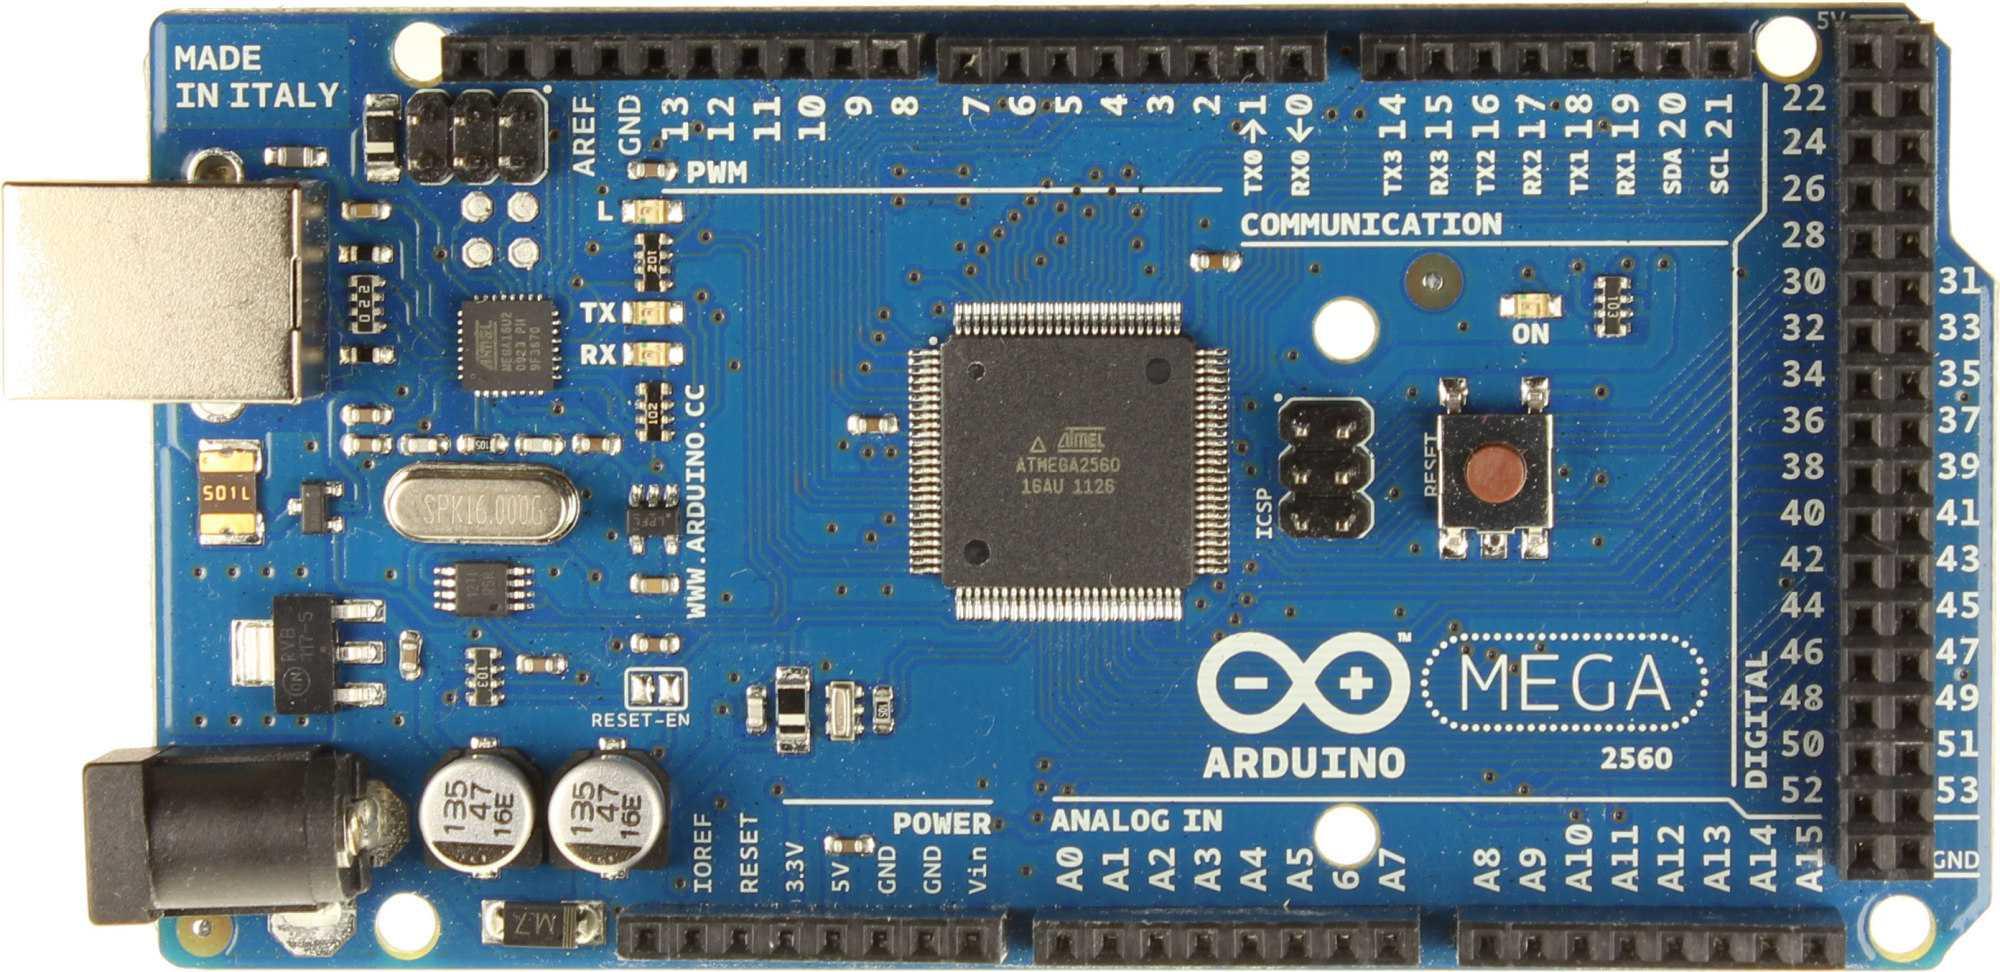 Arduino Mega 2560, der Kontaktfreudige unter den Arduinos